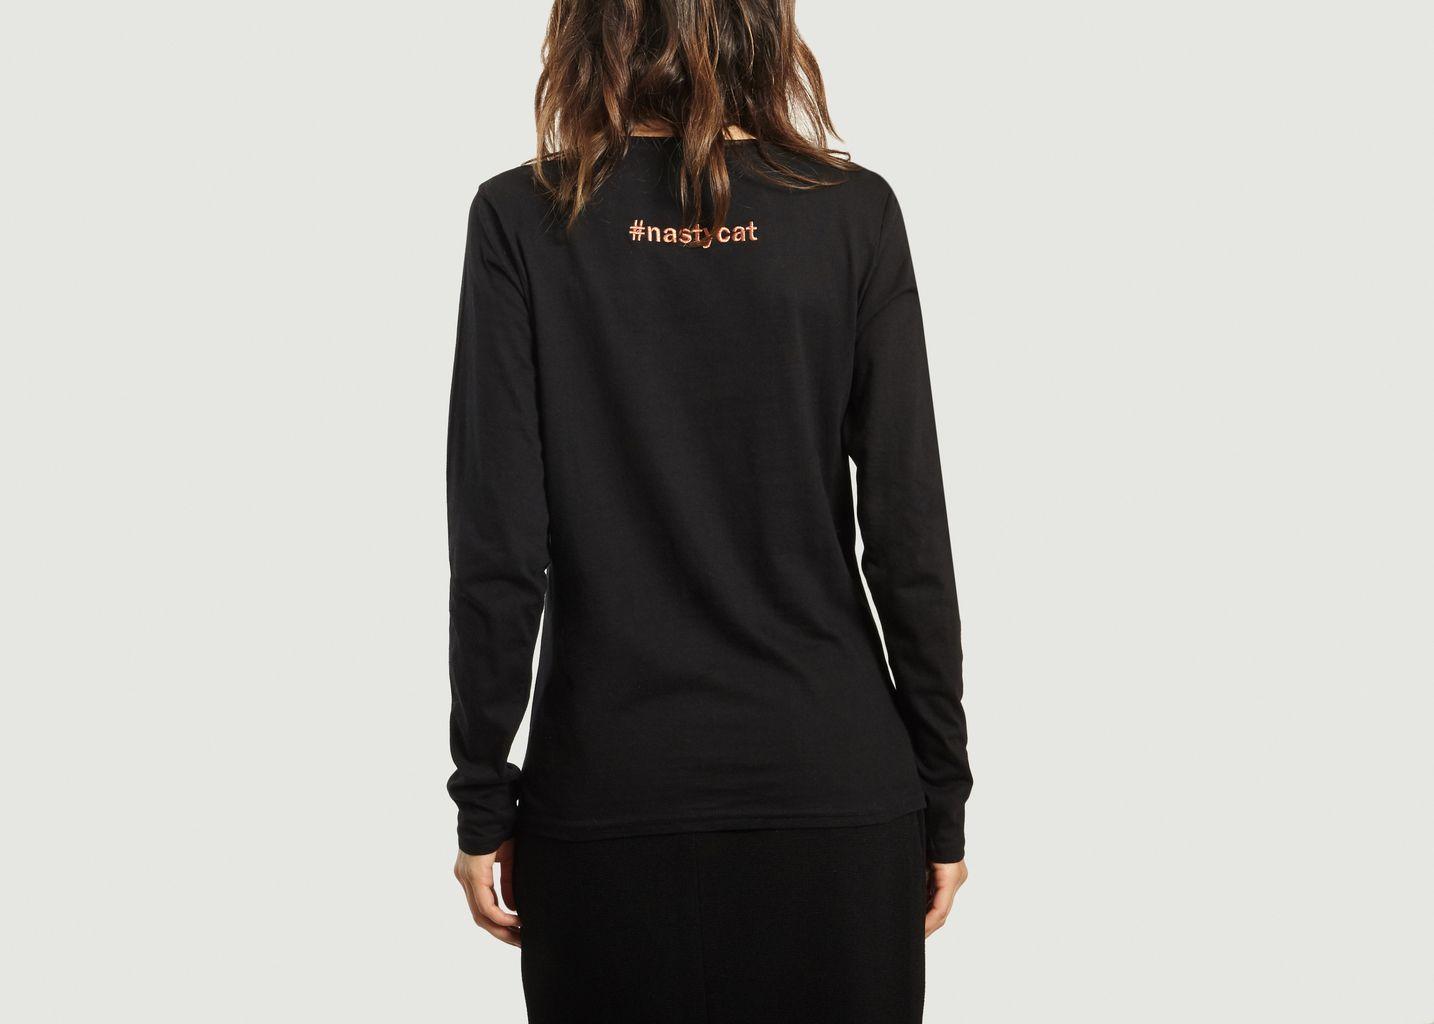 T-Shirt Nastycat  - Erotokritos